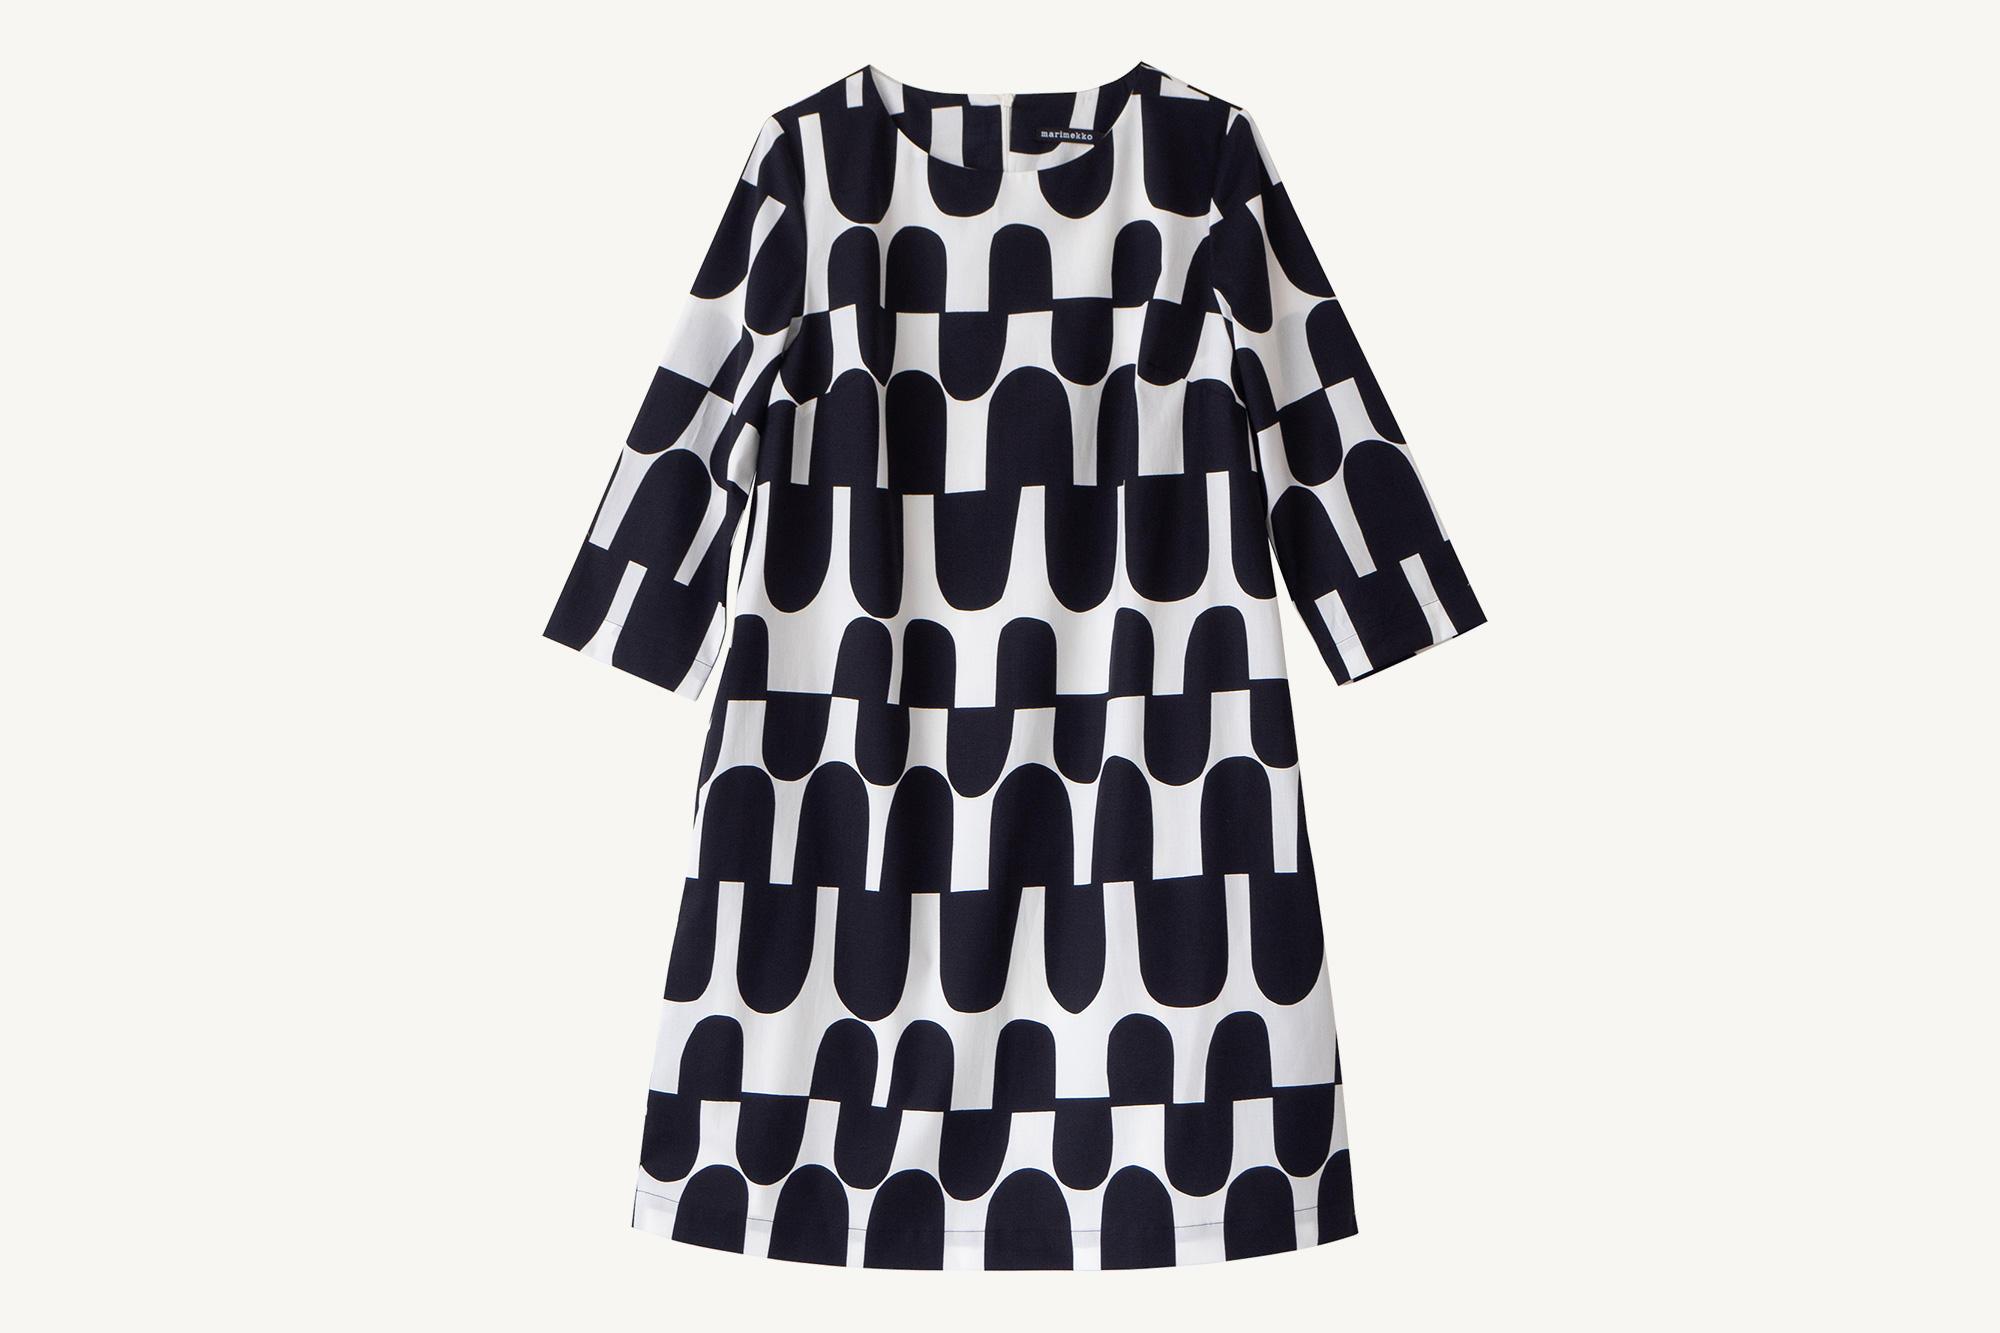 5.31- New Dresses Tarha / Ratsu / Mynsteri